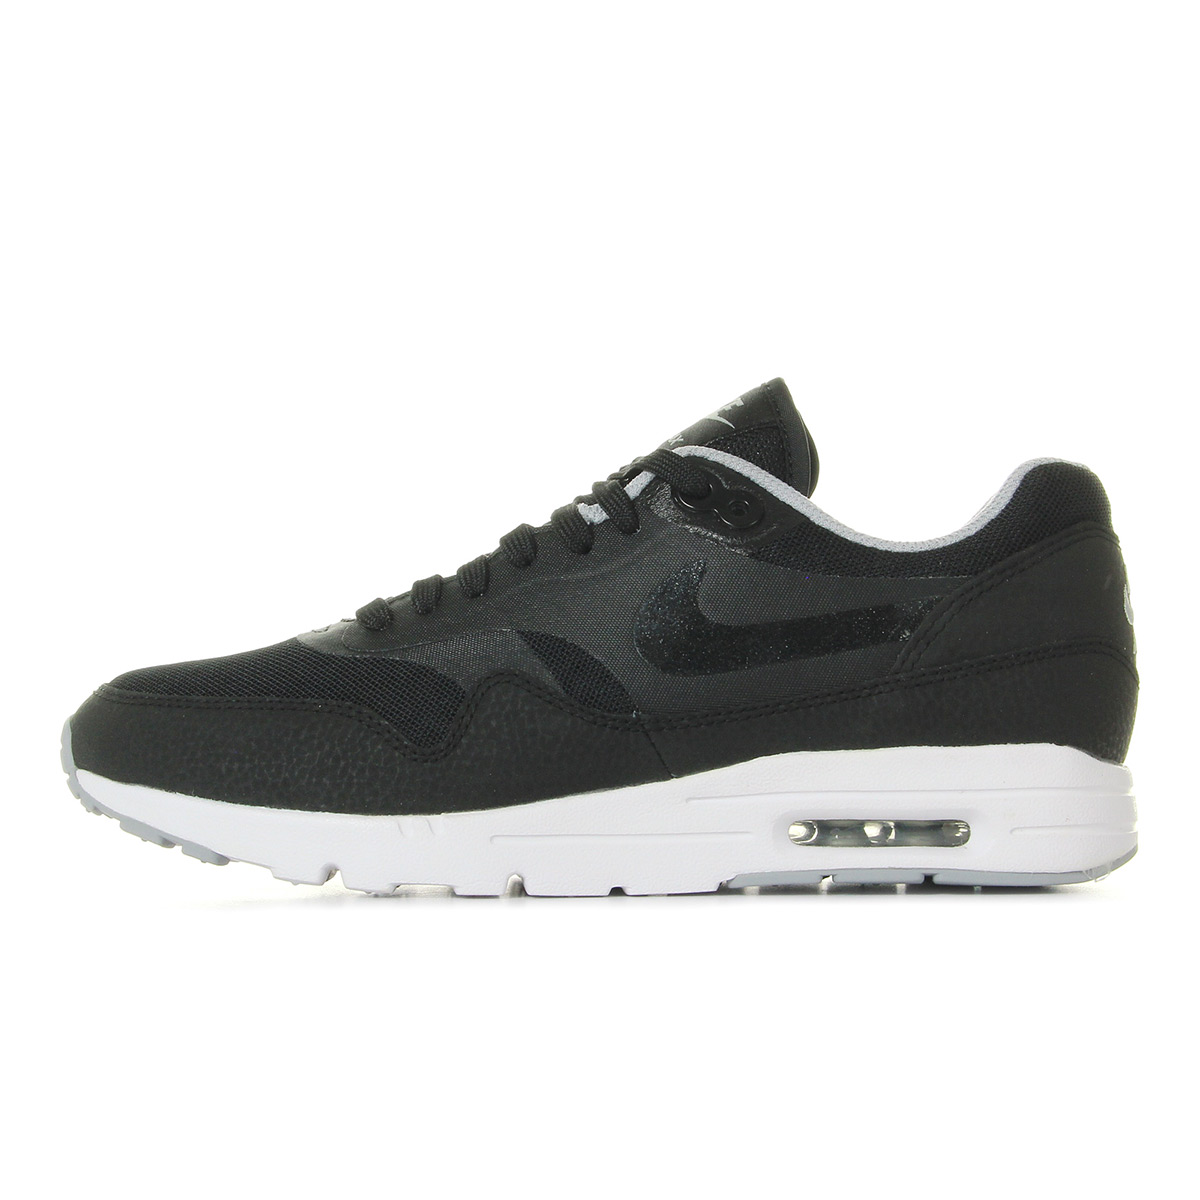 Nike Air Max 1 Ultra Essential 704993004, Baskets mode